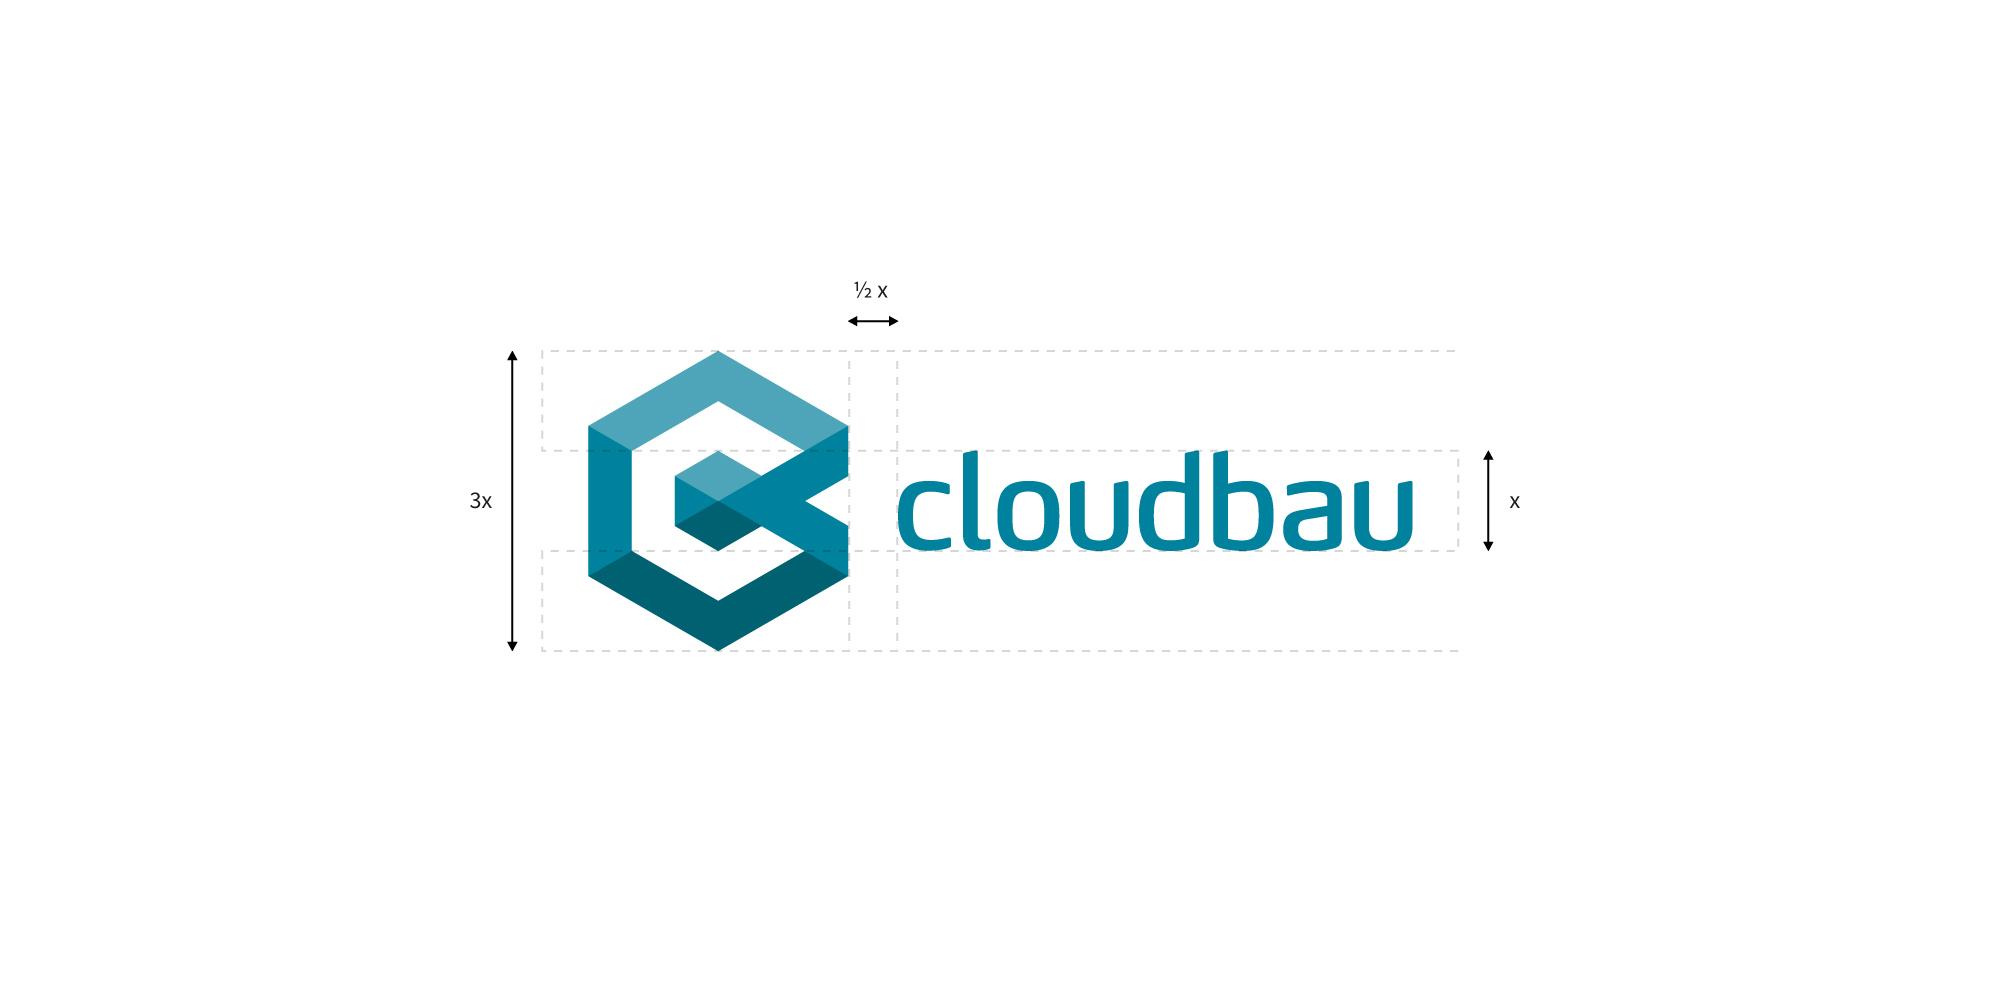 cloudbau04